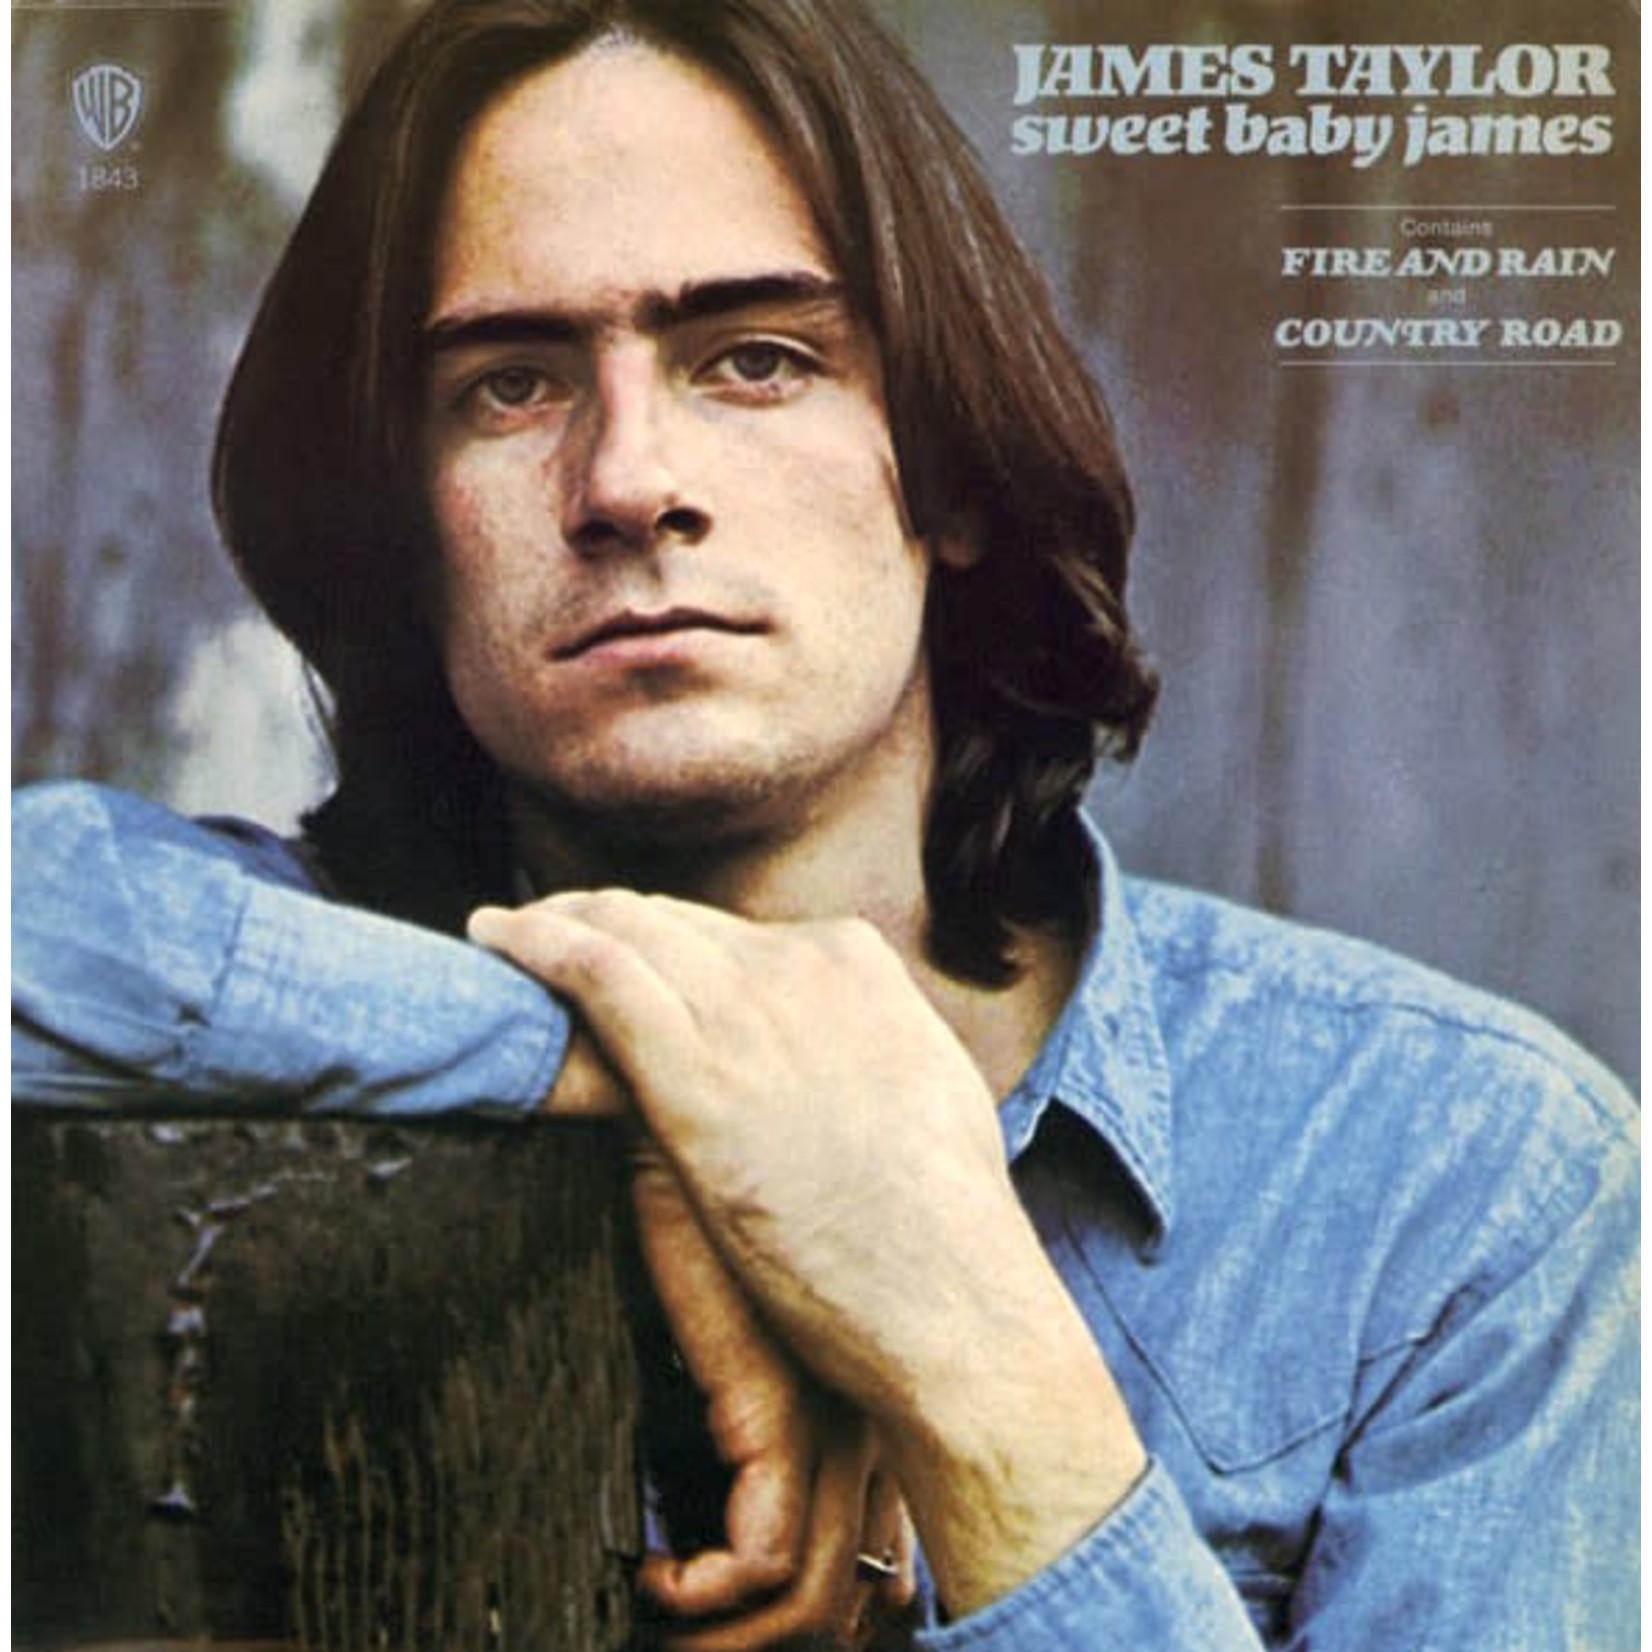 [Vintage] Taylor, James: Sweet Baby James